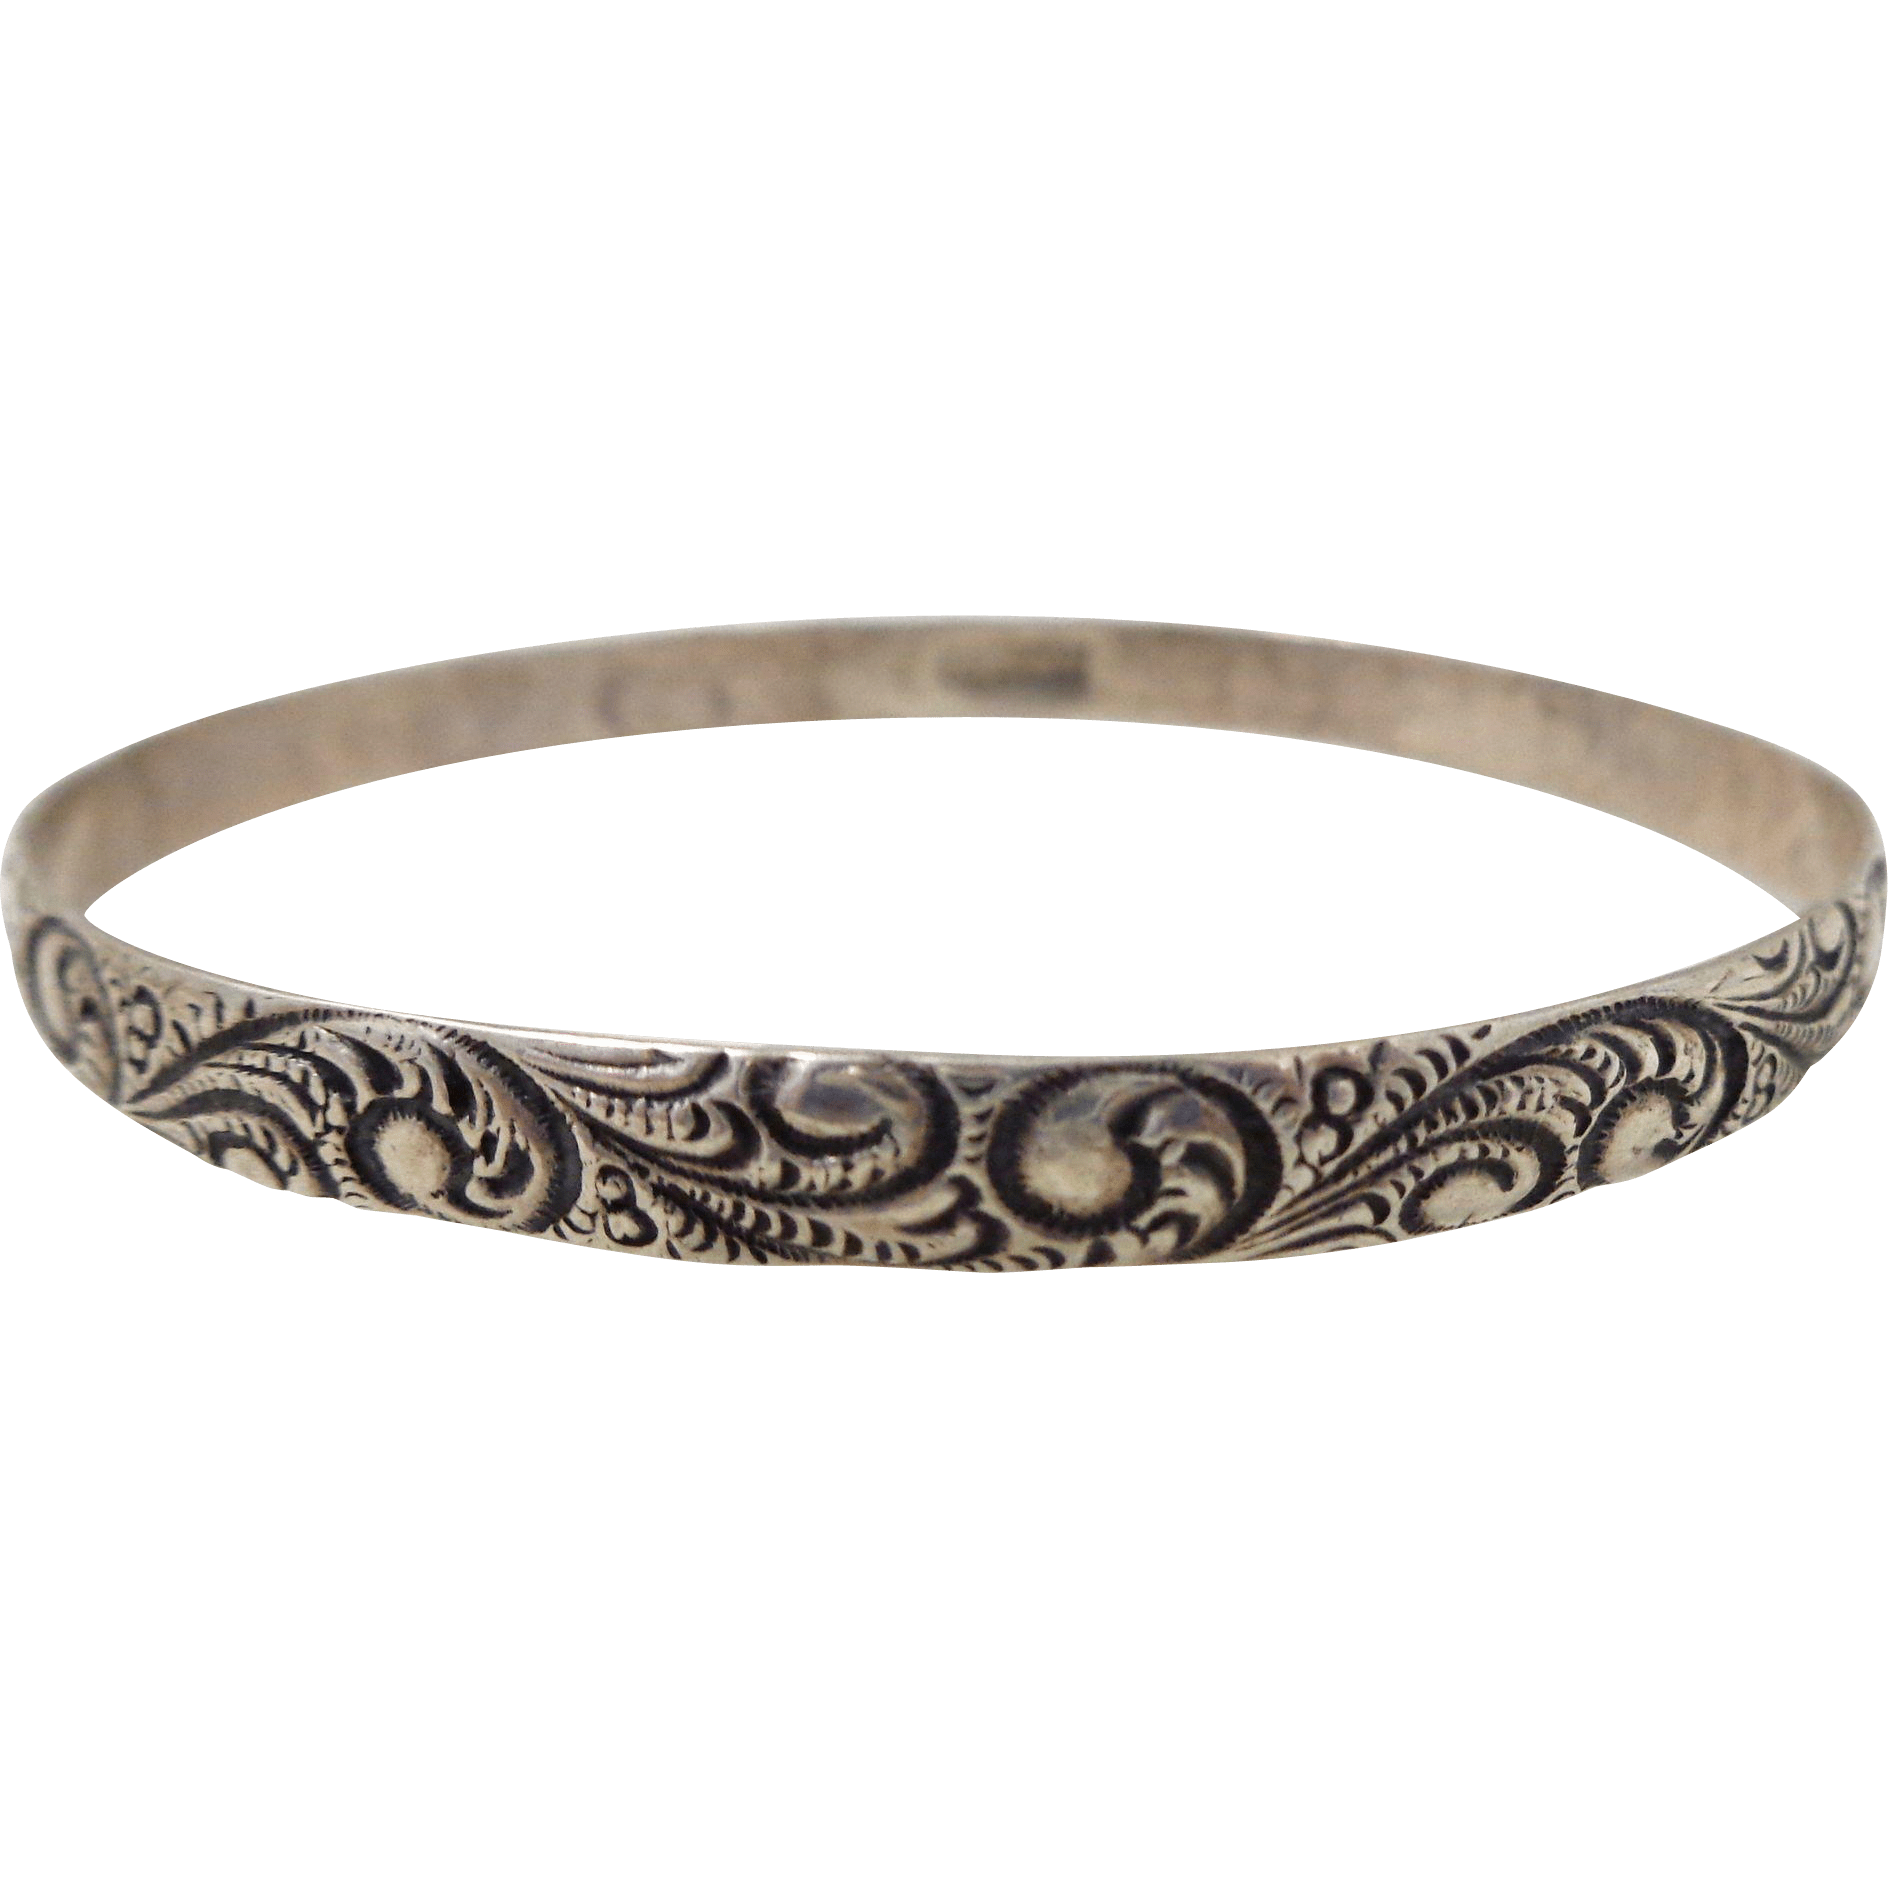 Vintage Danecraft Sterling Silver Paisley Bangle Bracelet